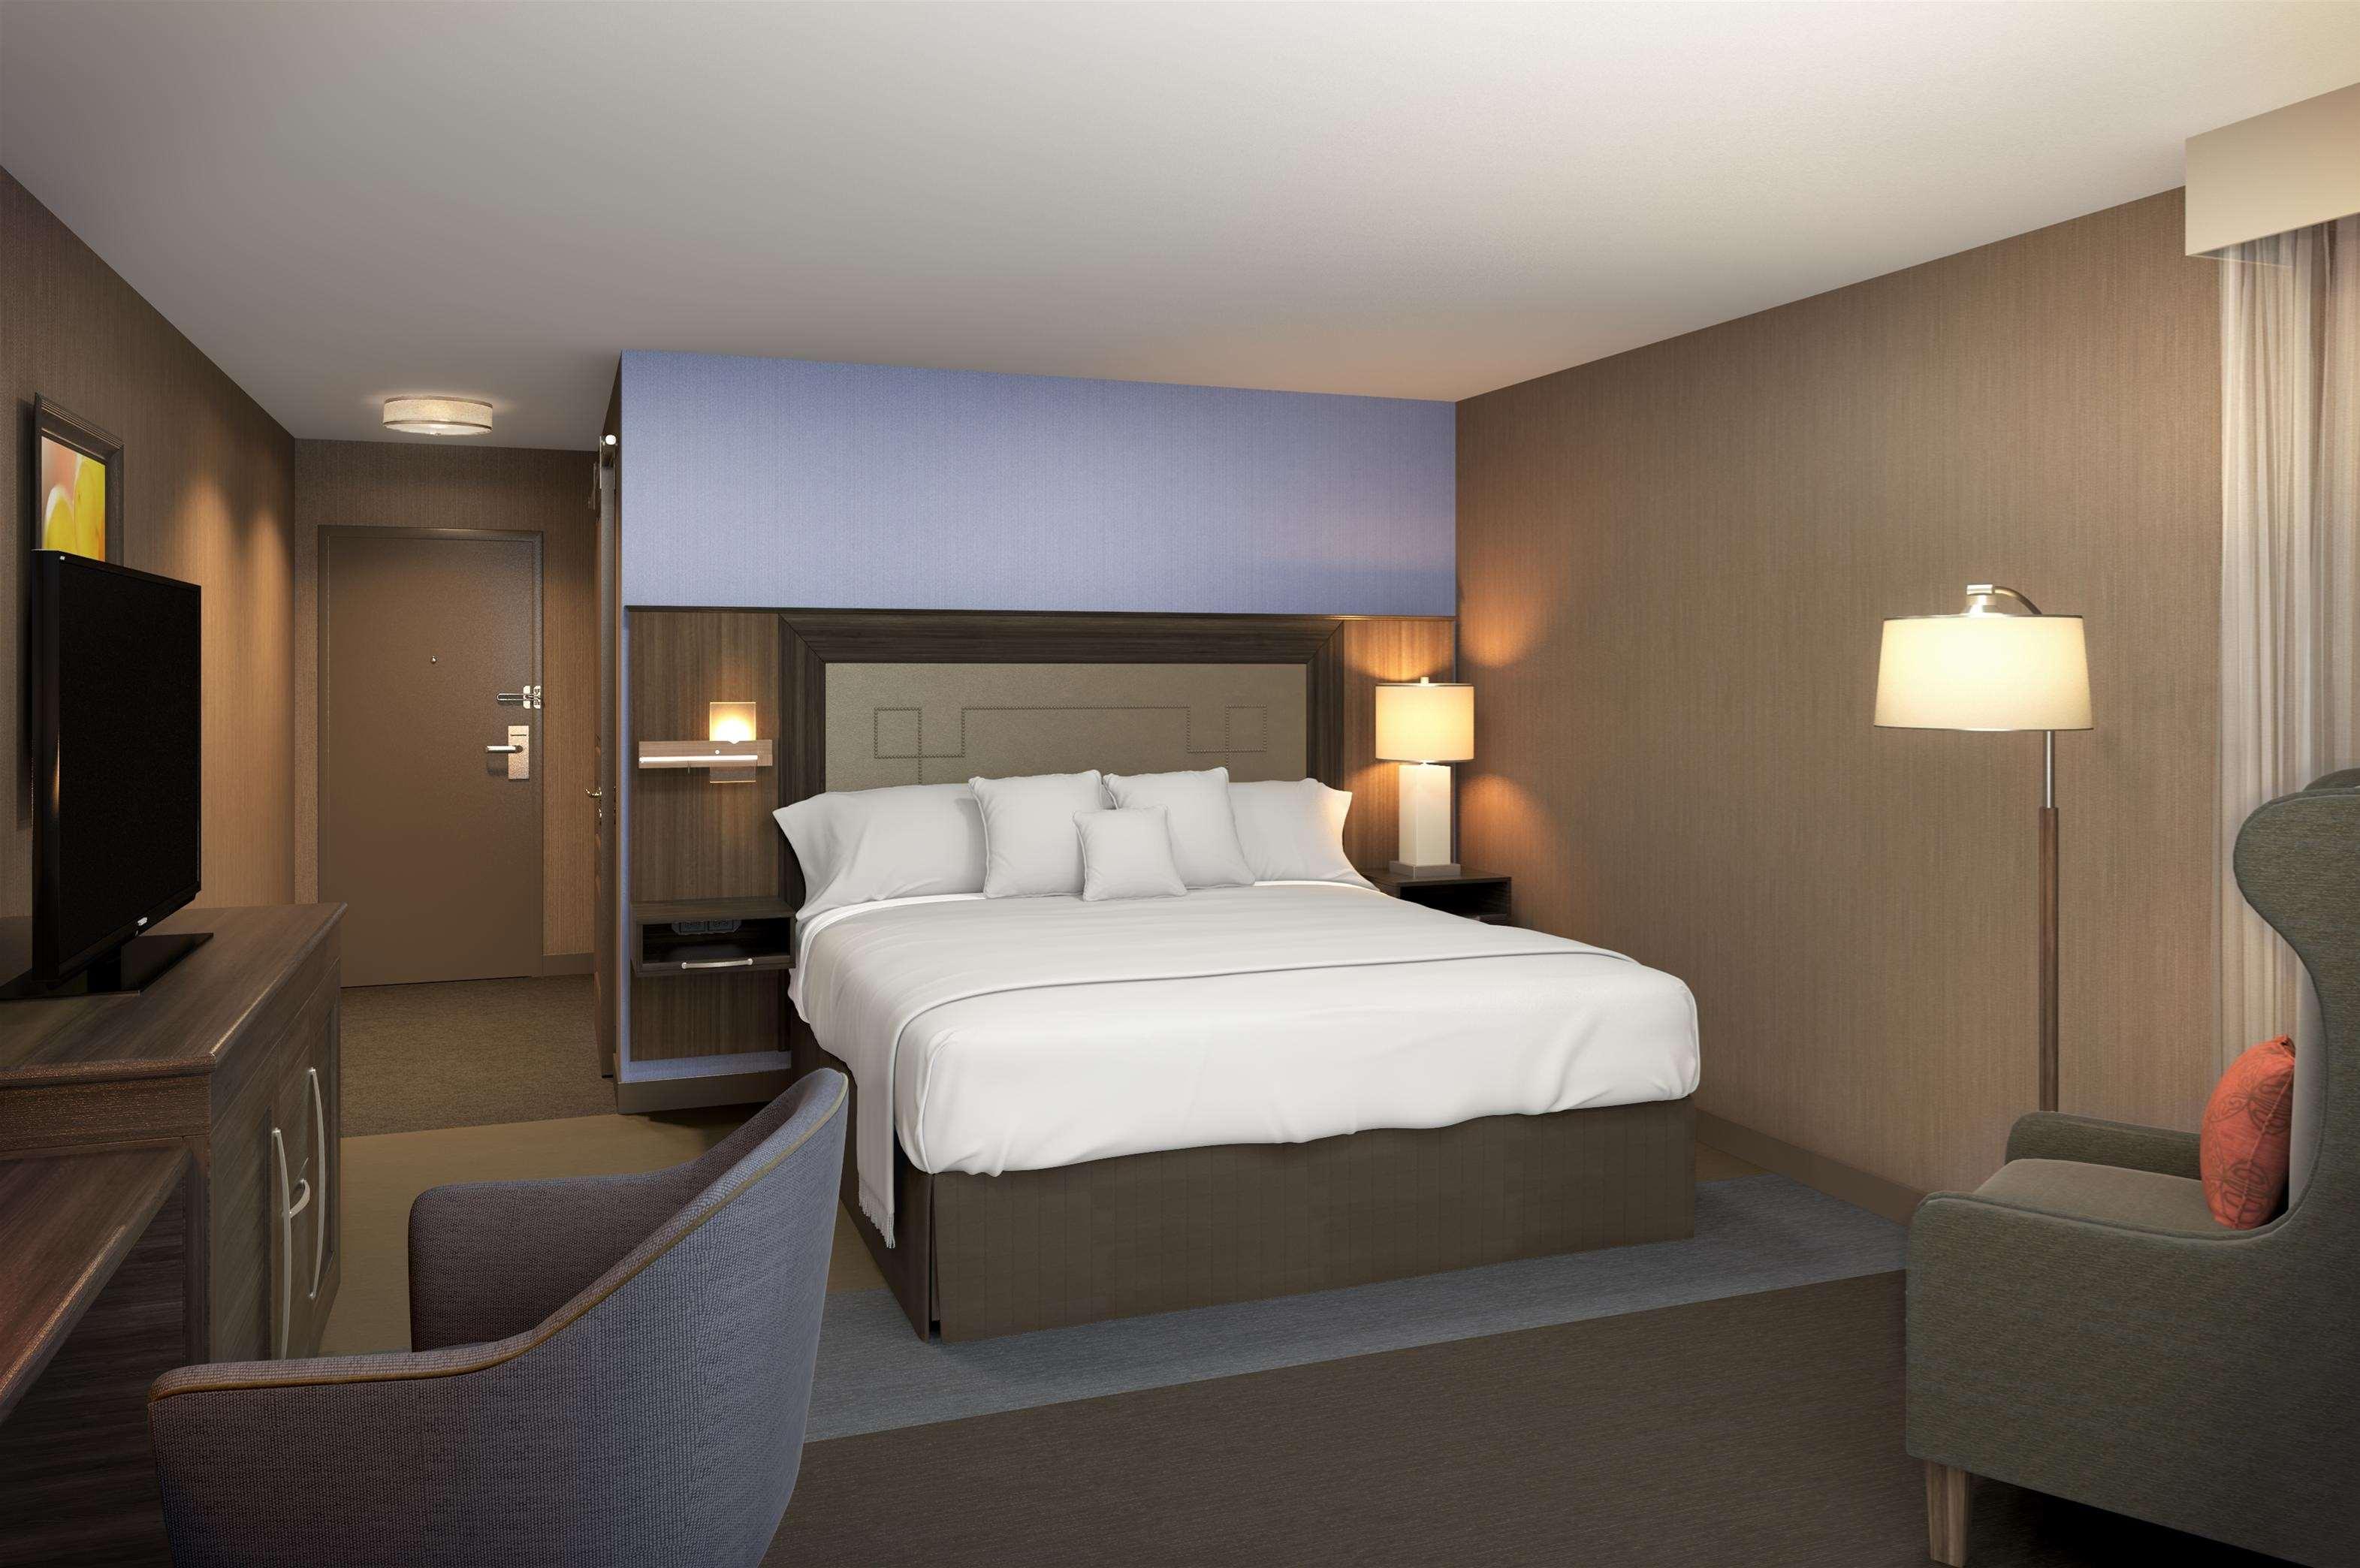 Hampton Inn & Suites Napa image 2